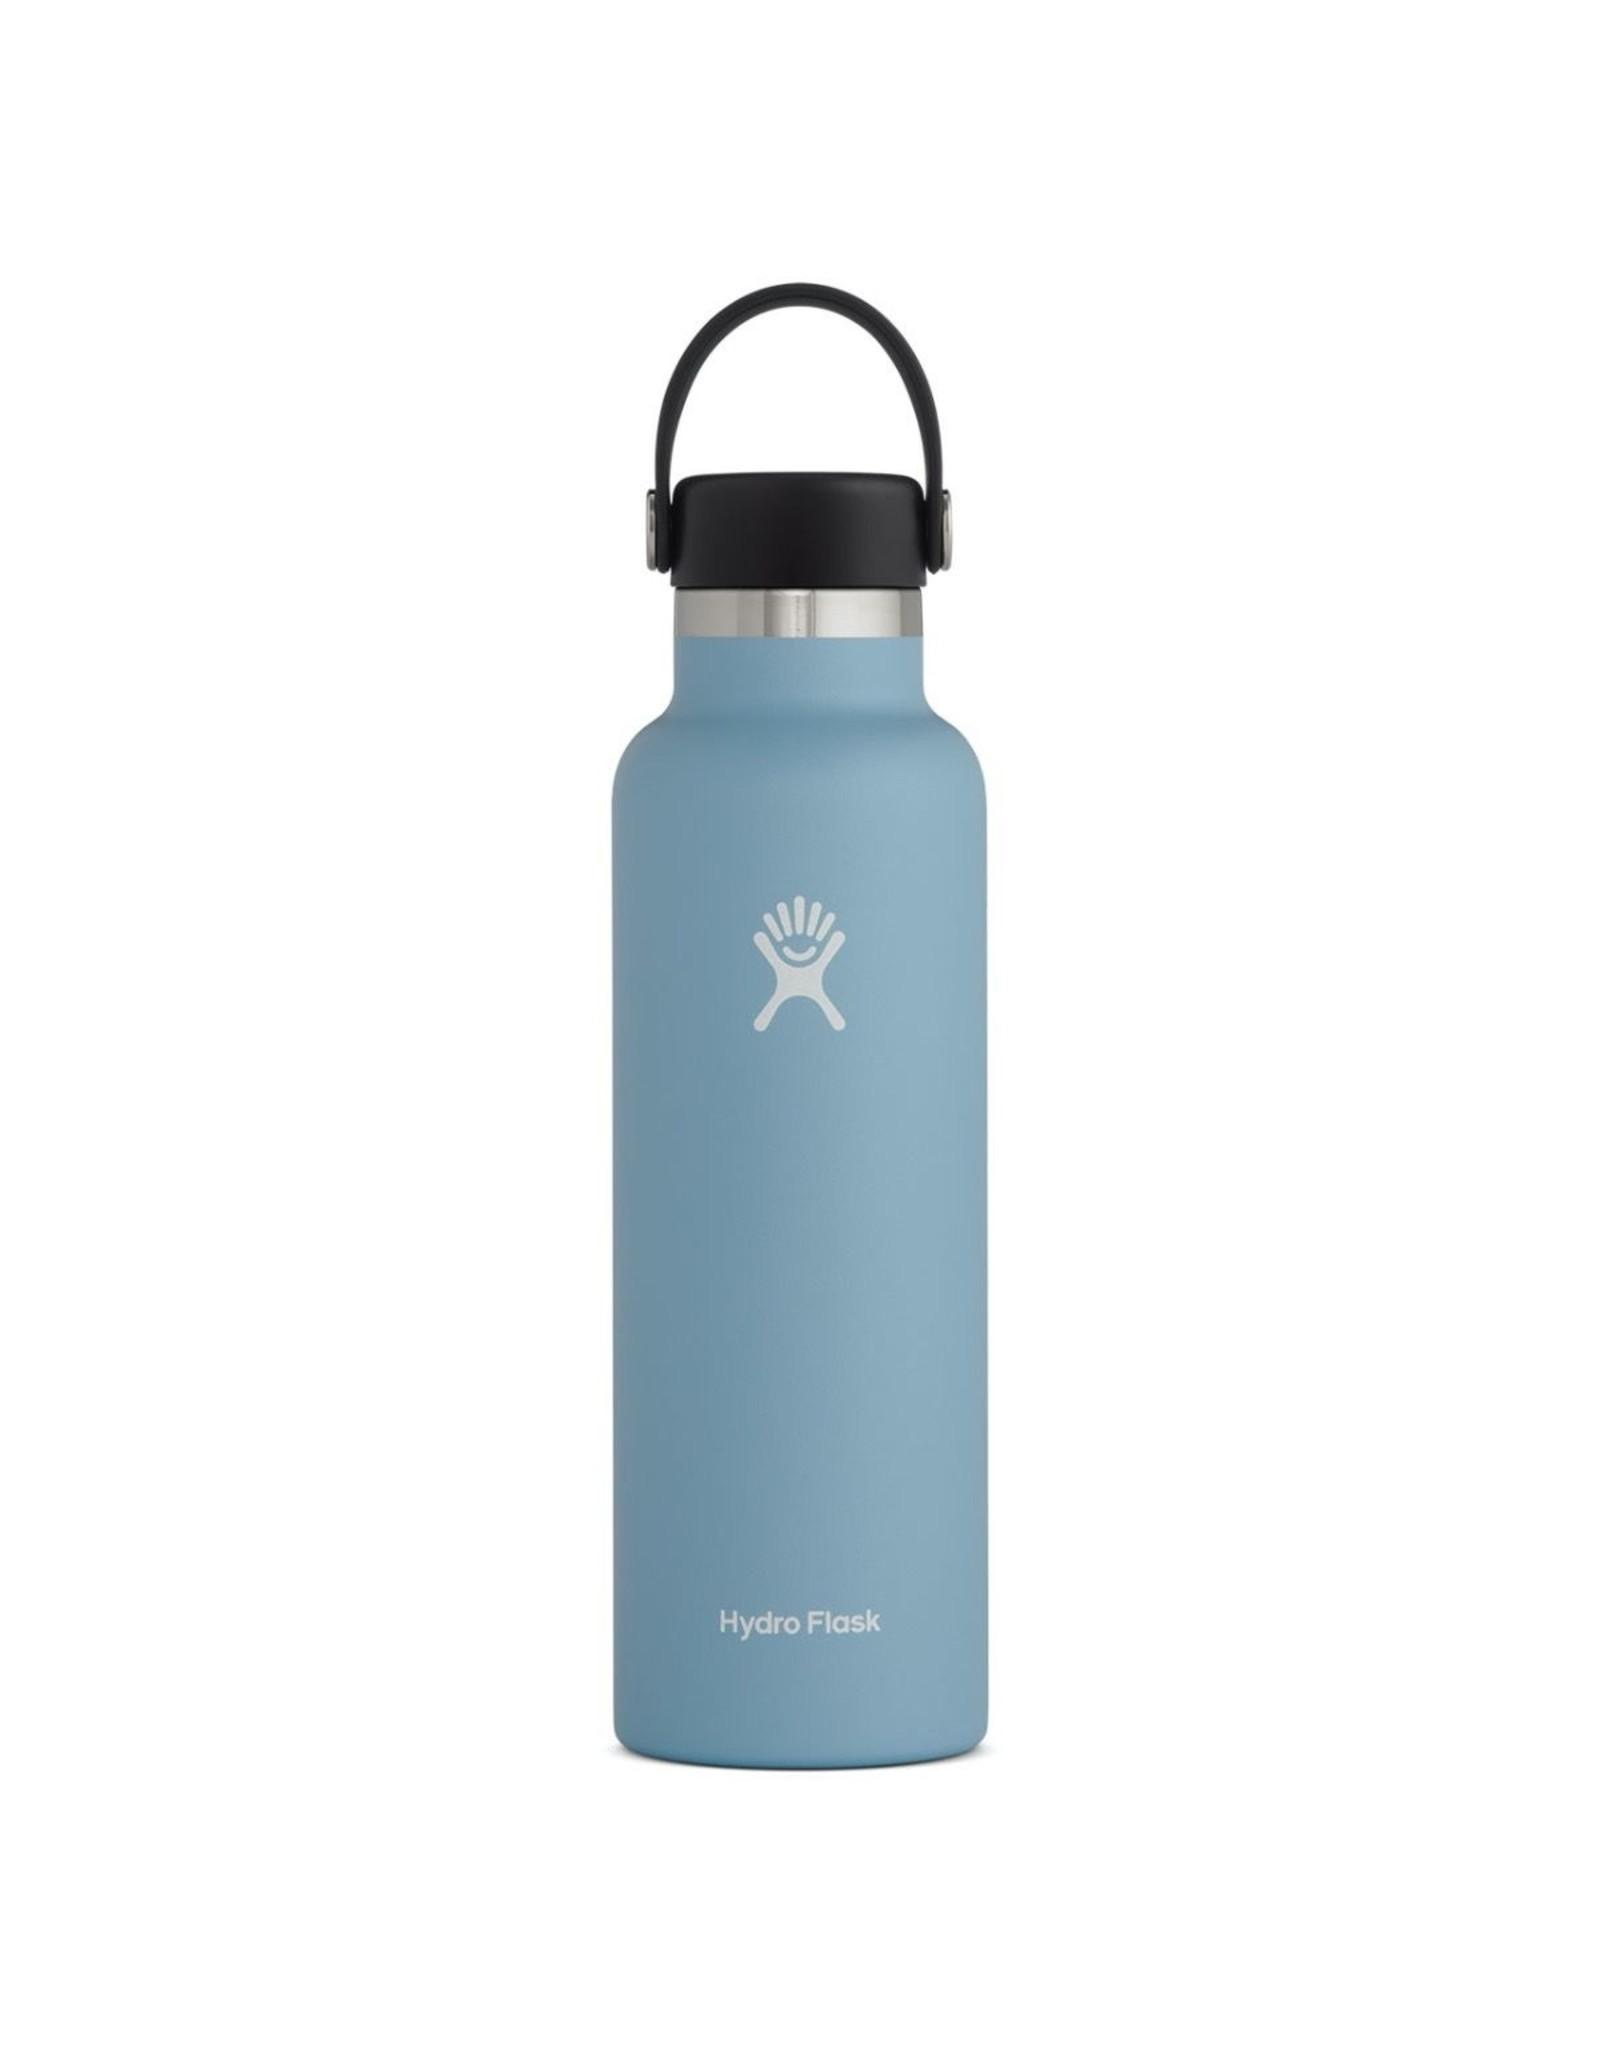 Hydro Flask Hydro Flask 21oz Standard Mouth w/ Flex Cap Rain